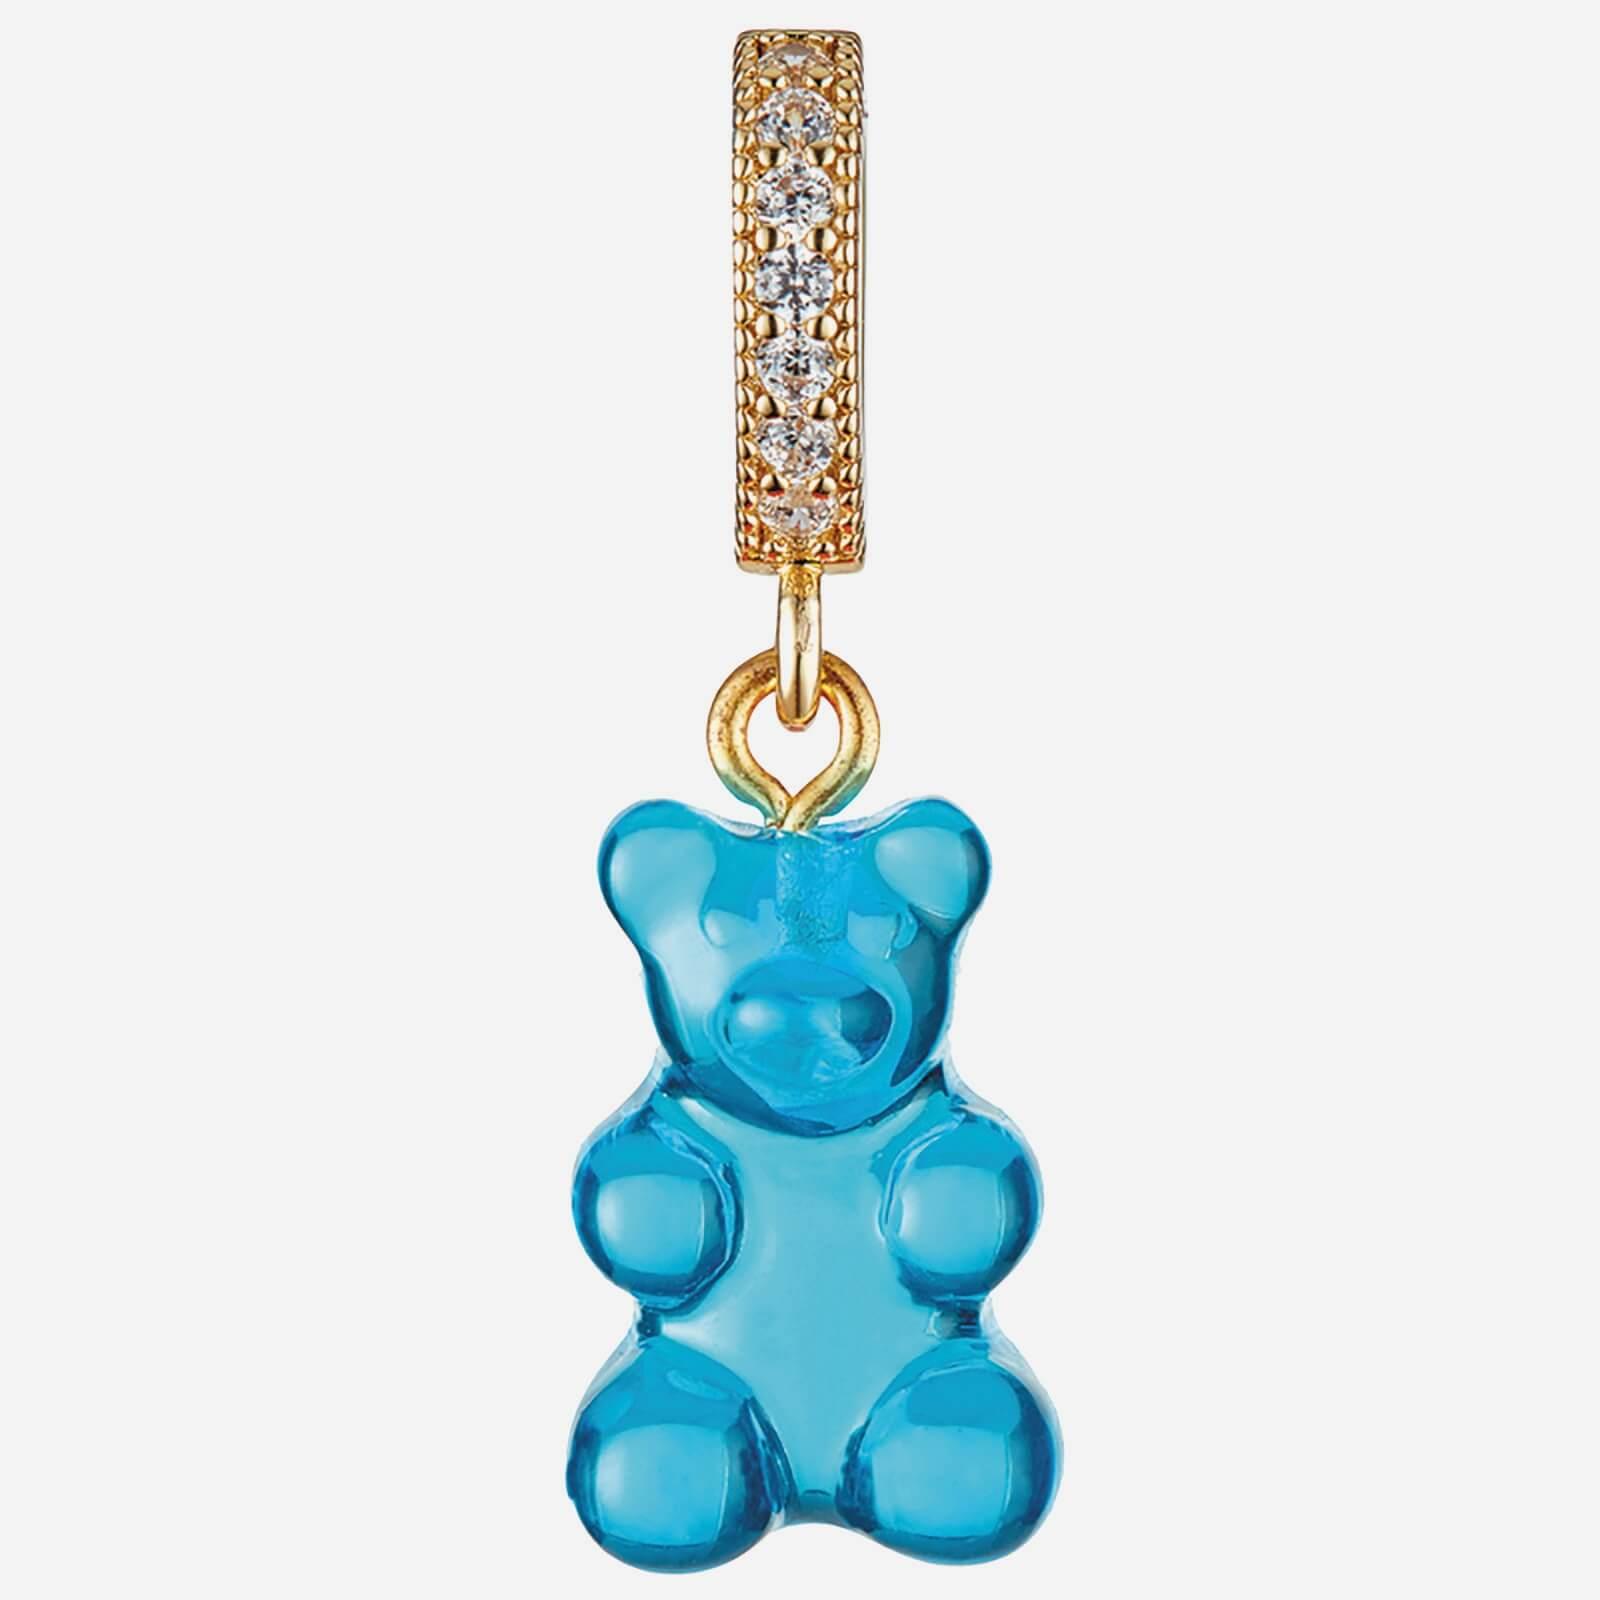 Crystal Haze Women's Jelly Nostalgia Bear Pave Pendant - Azure